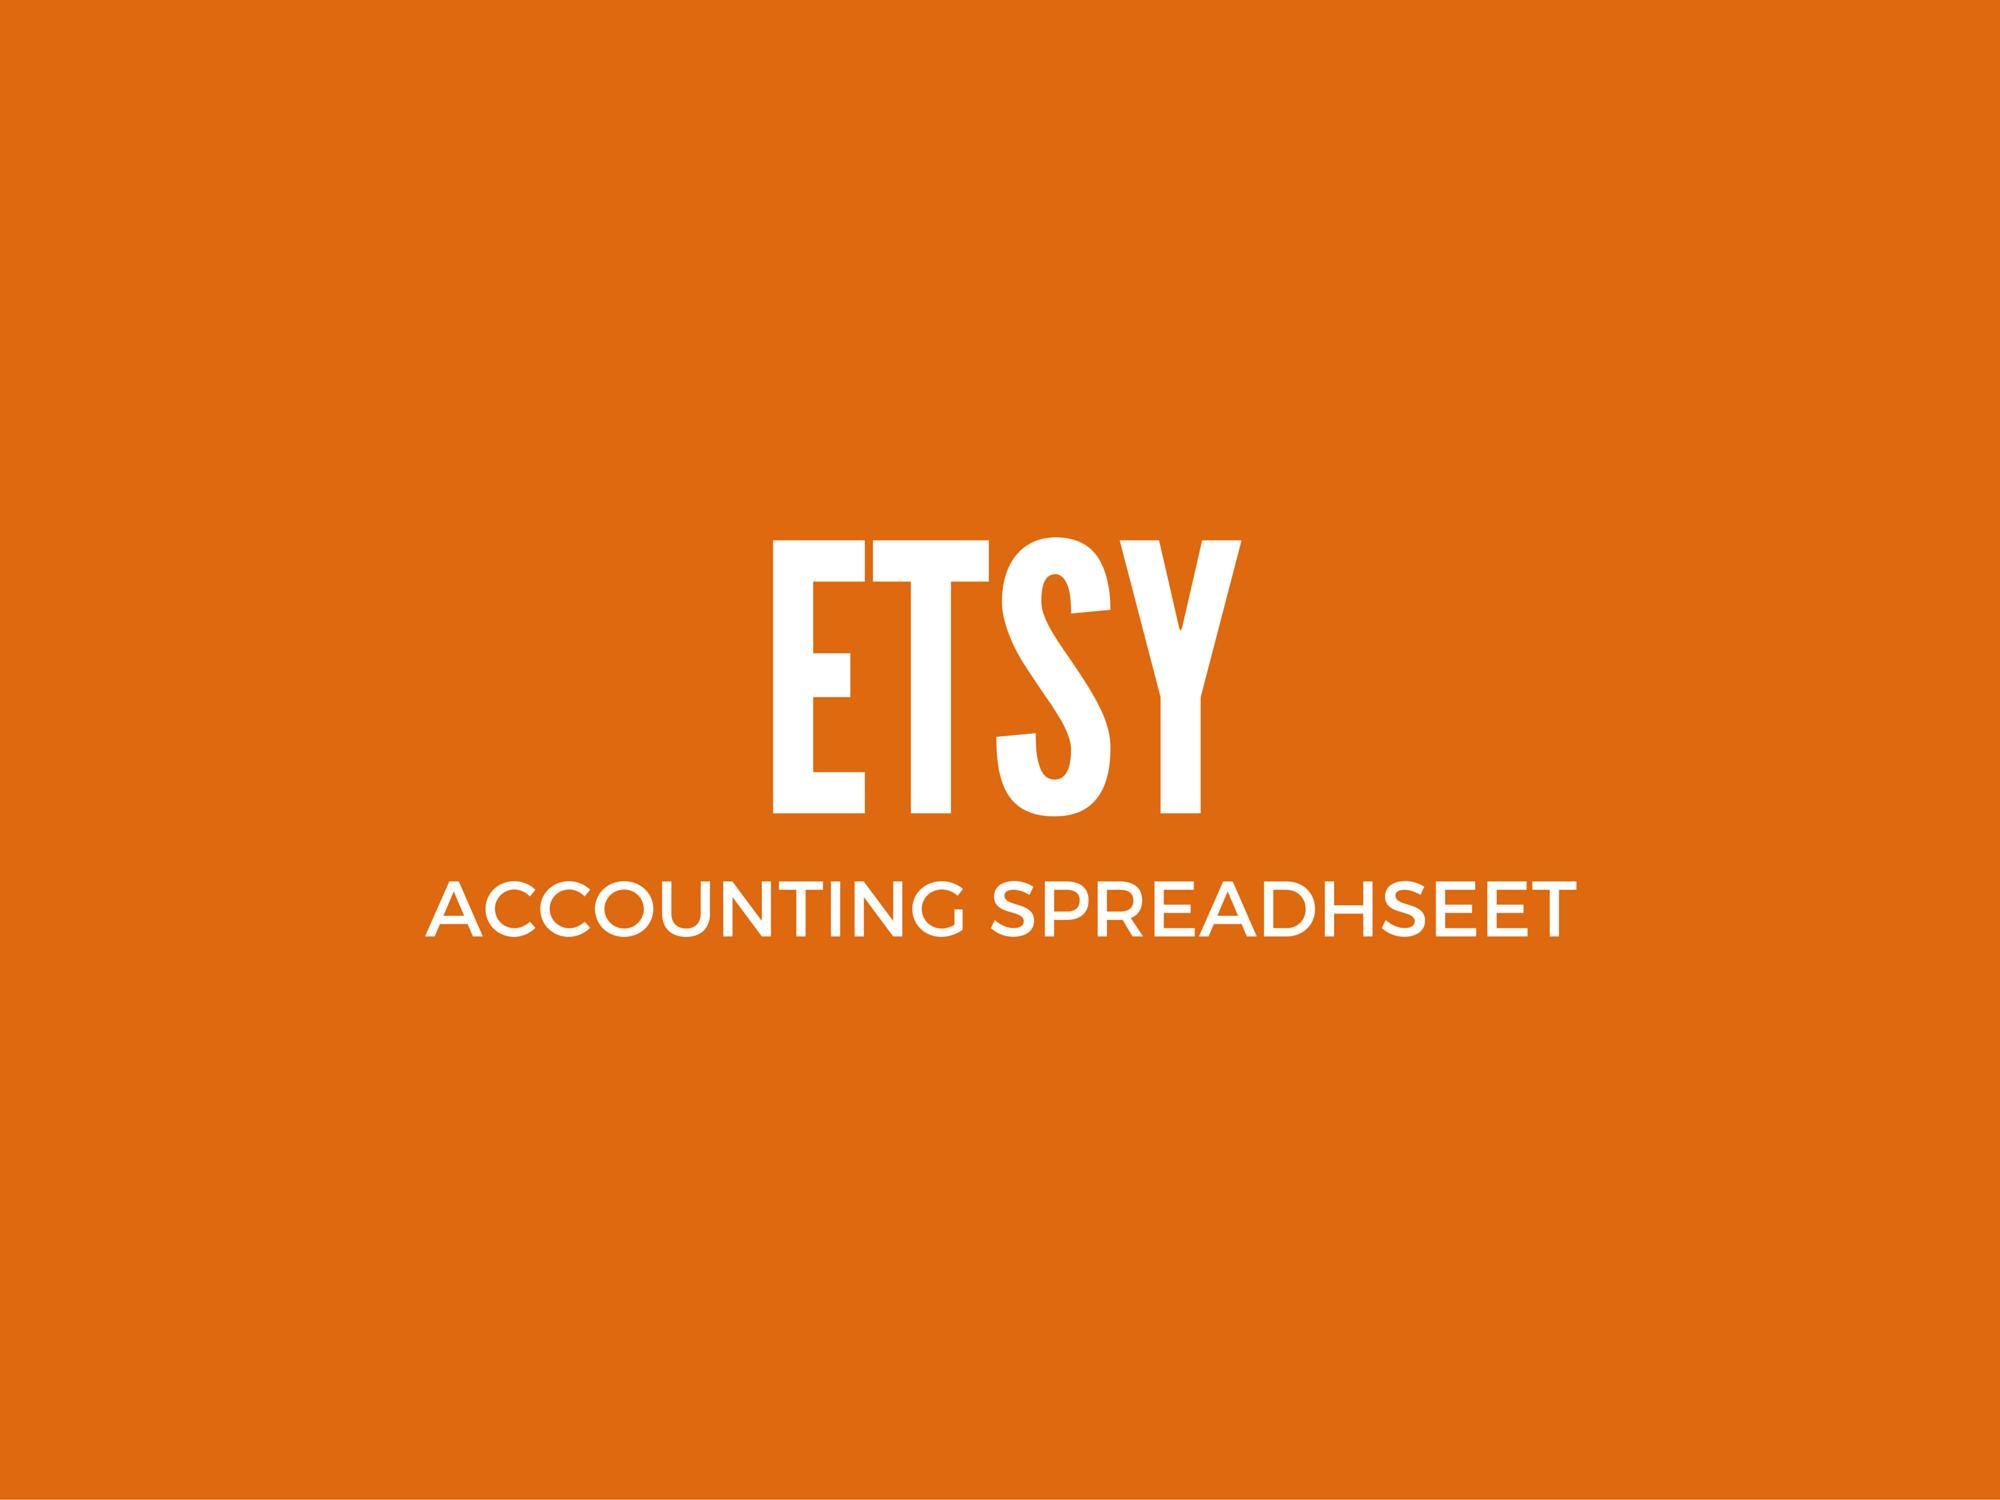 Etsy Accounting Spreadsheet